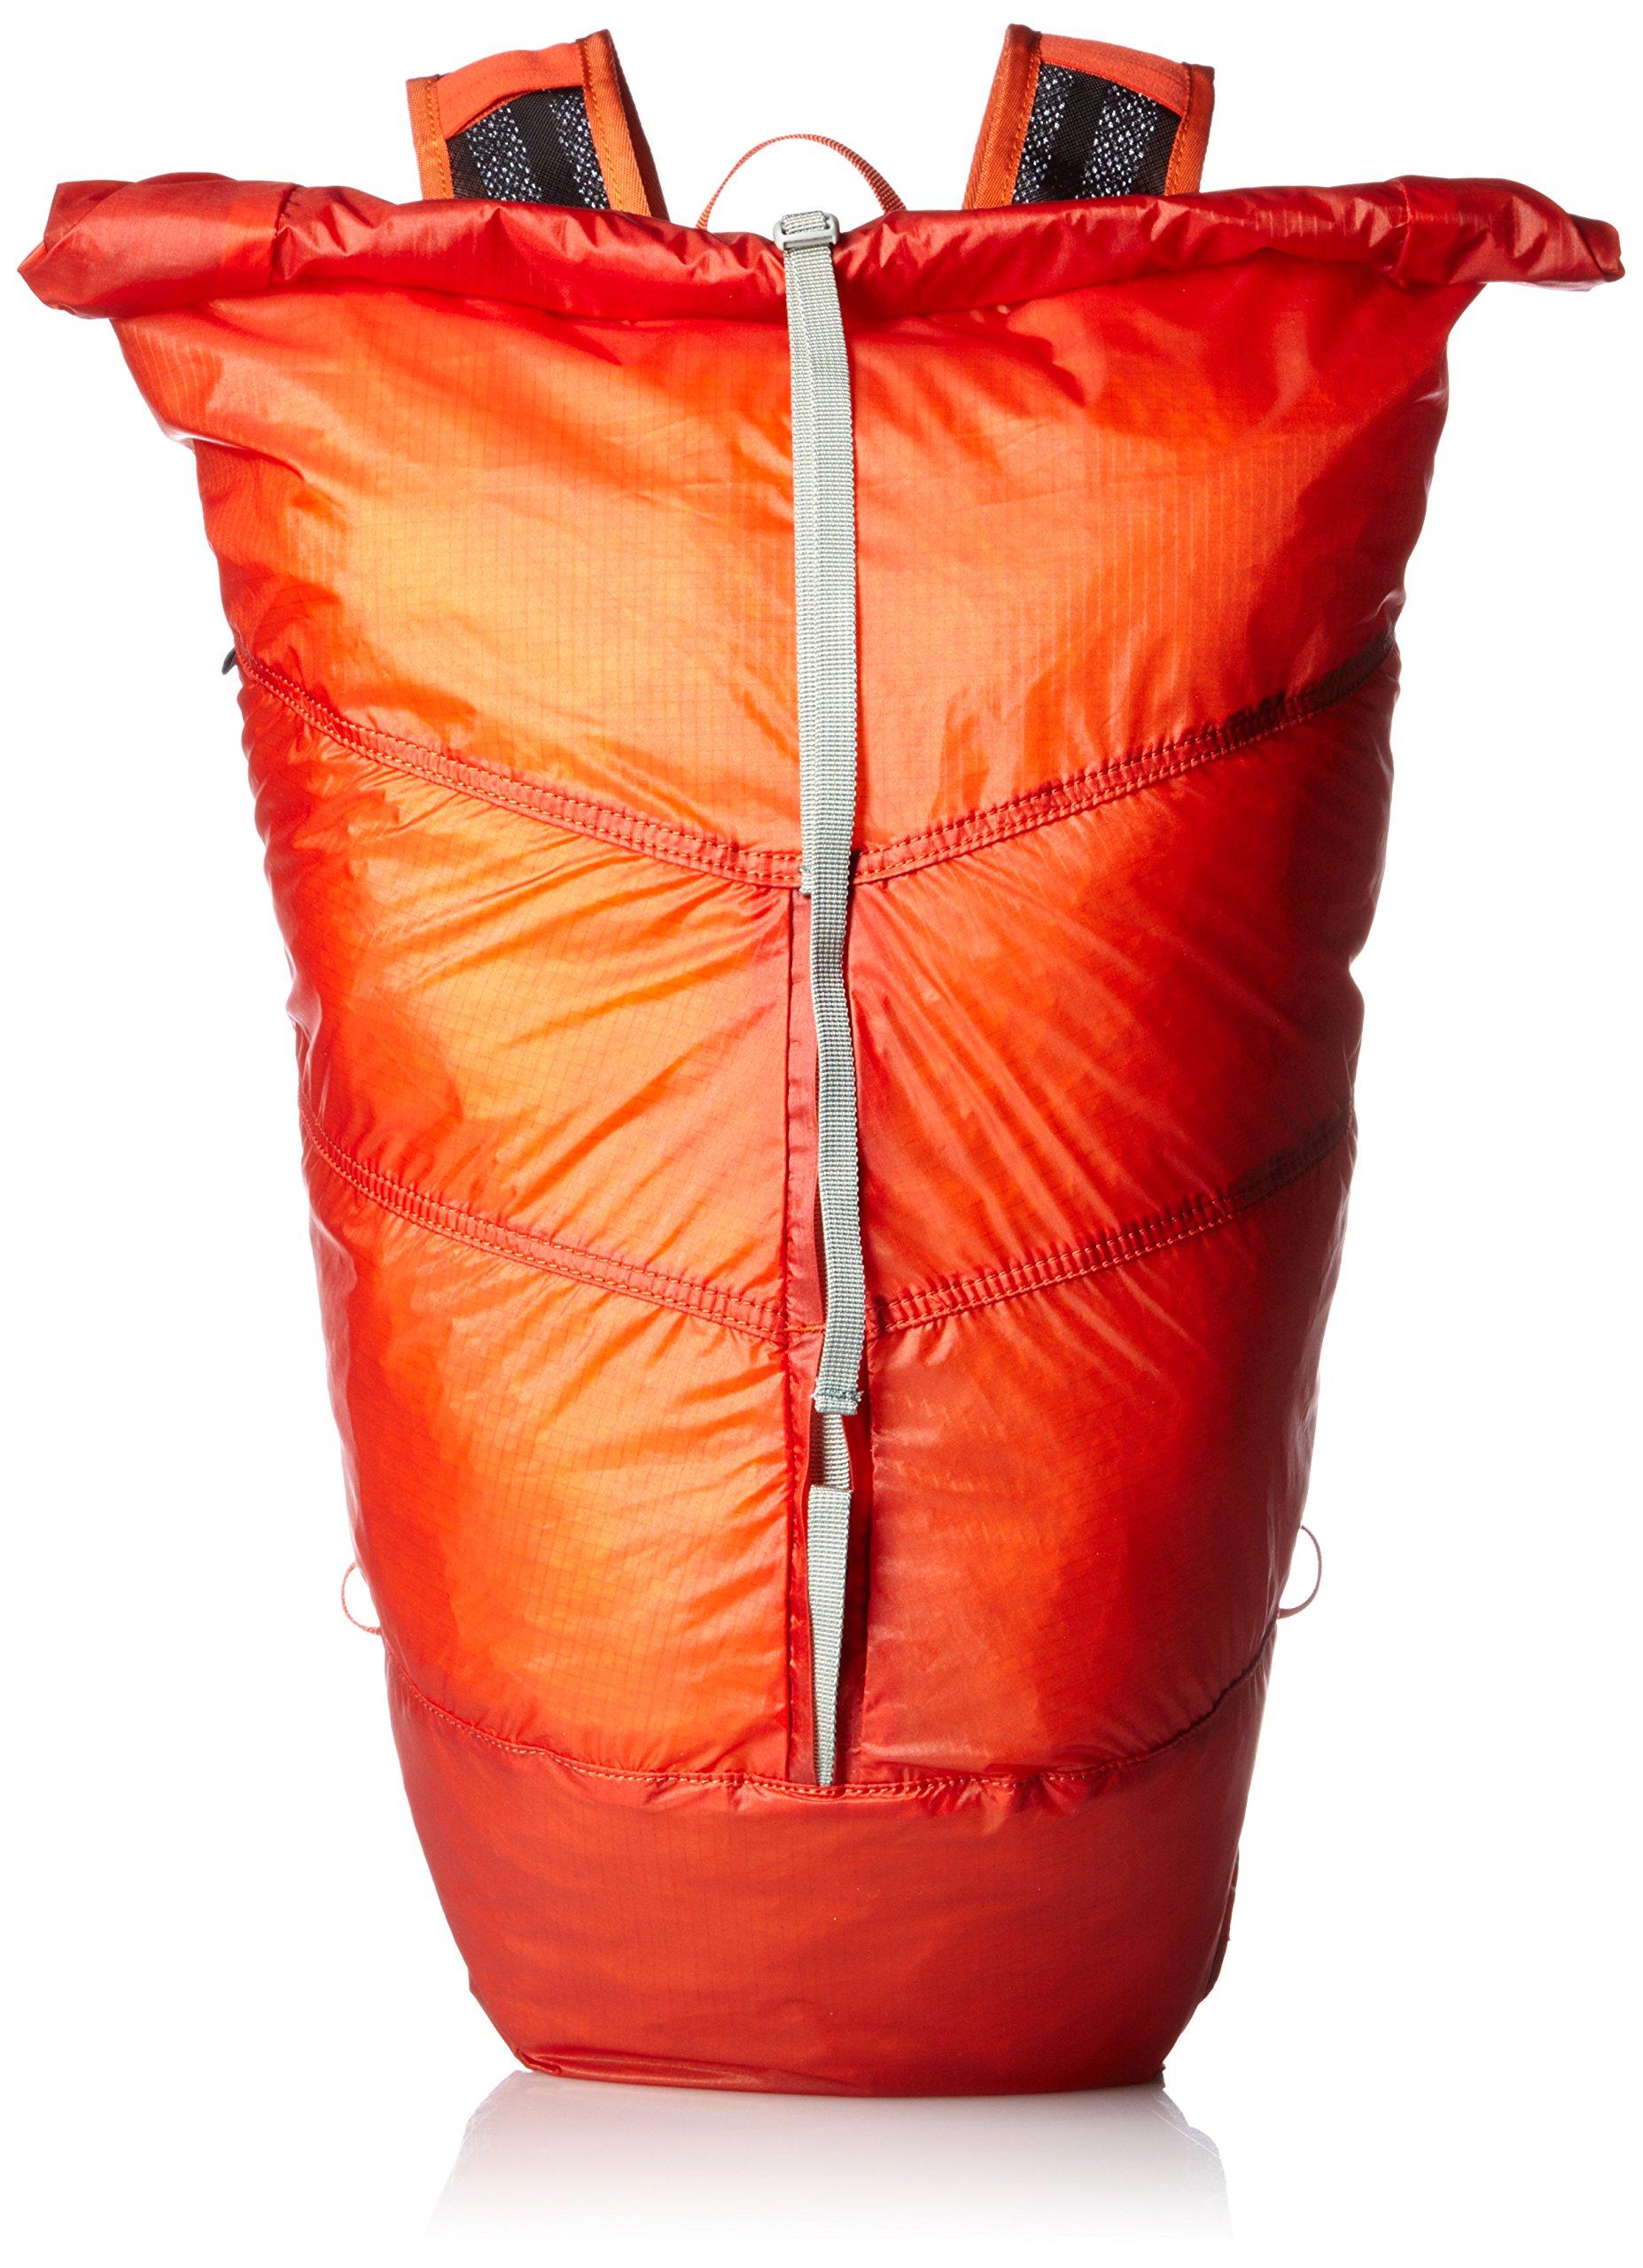 Boreas Taurus Ultra-light Packable Daypack